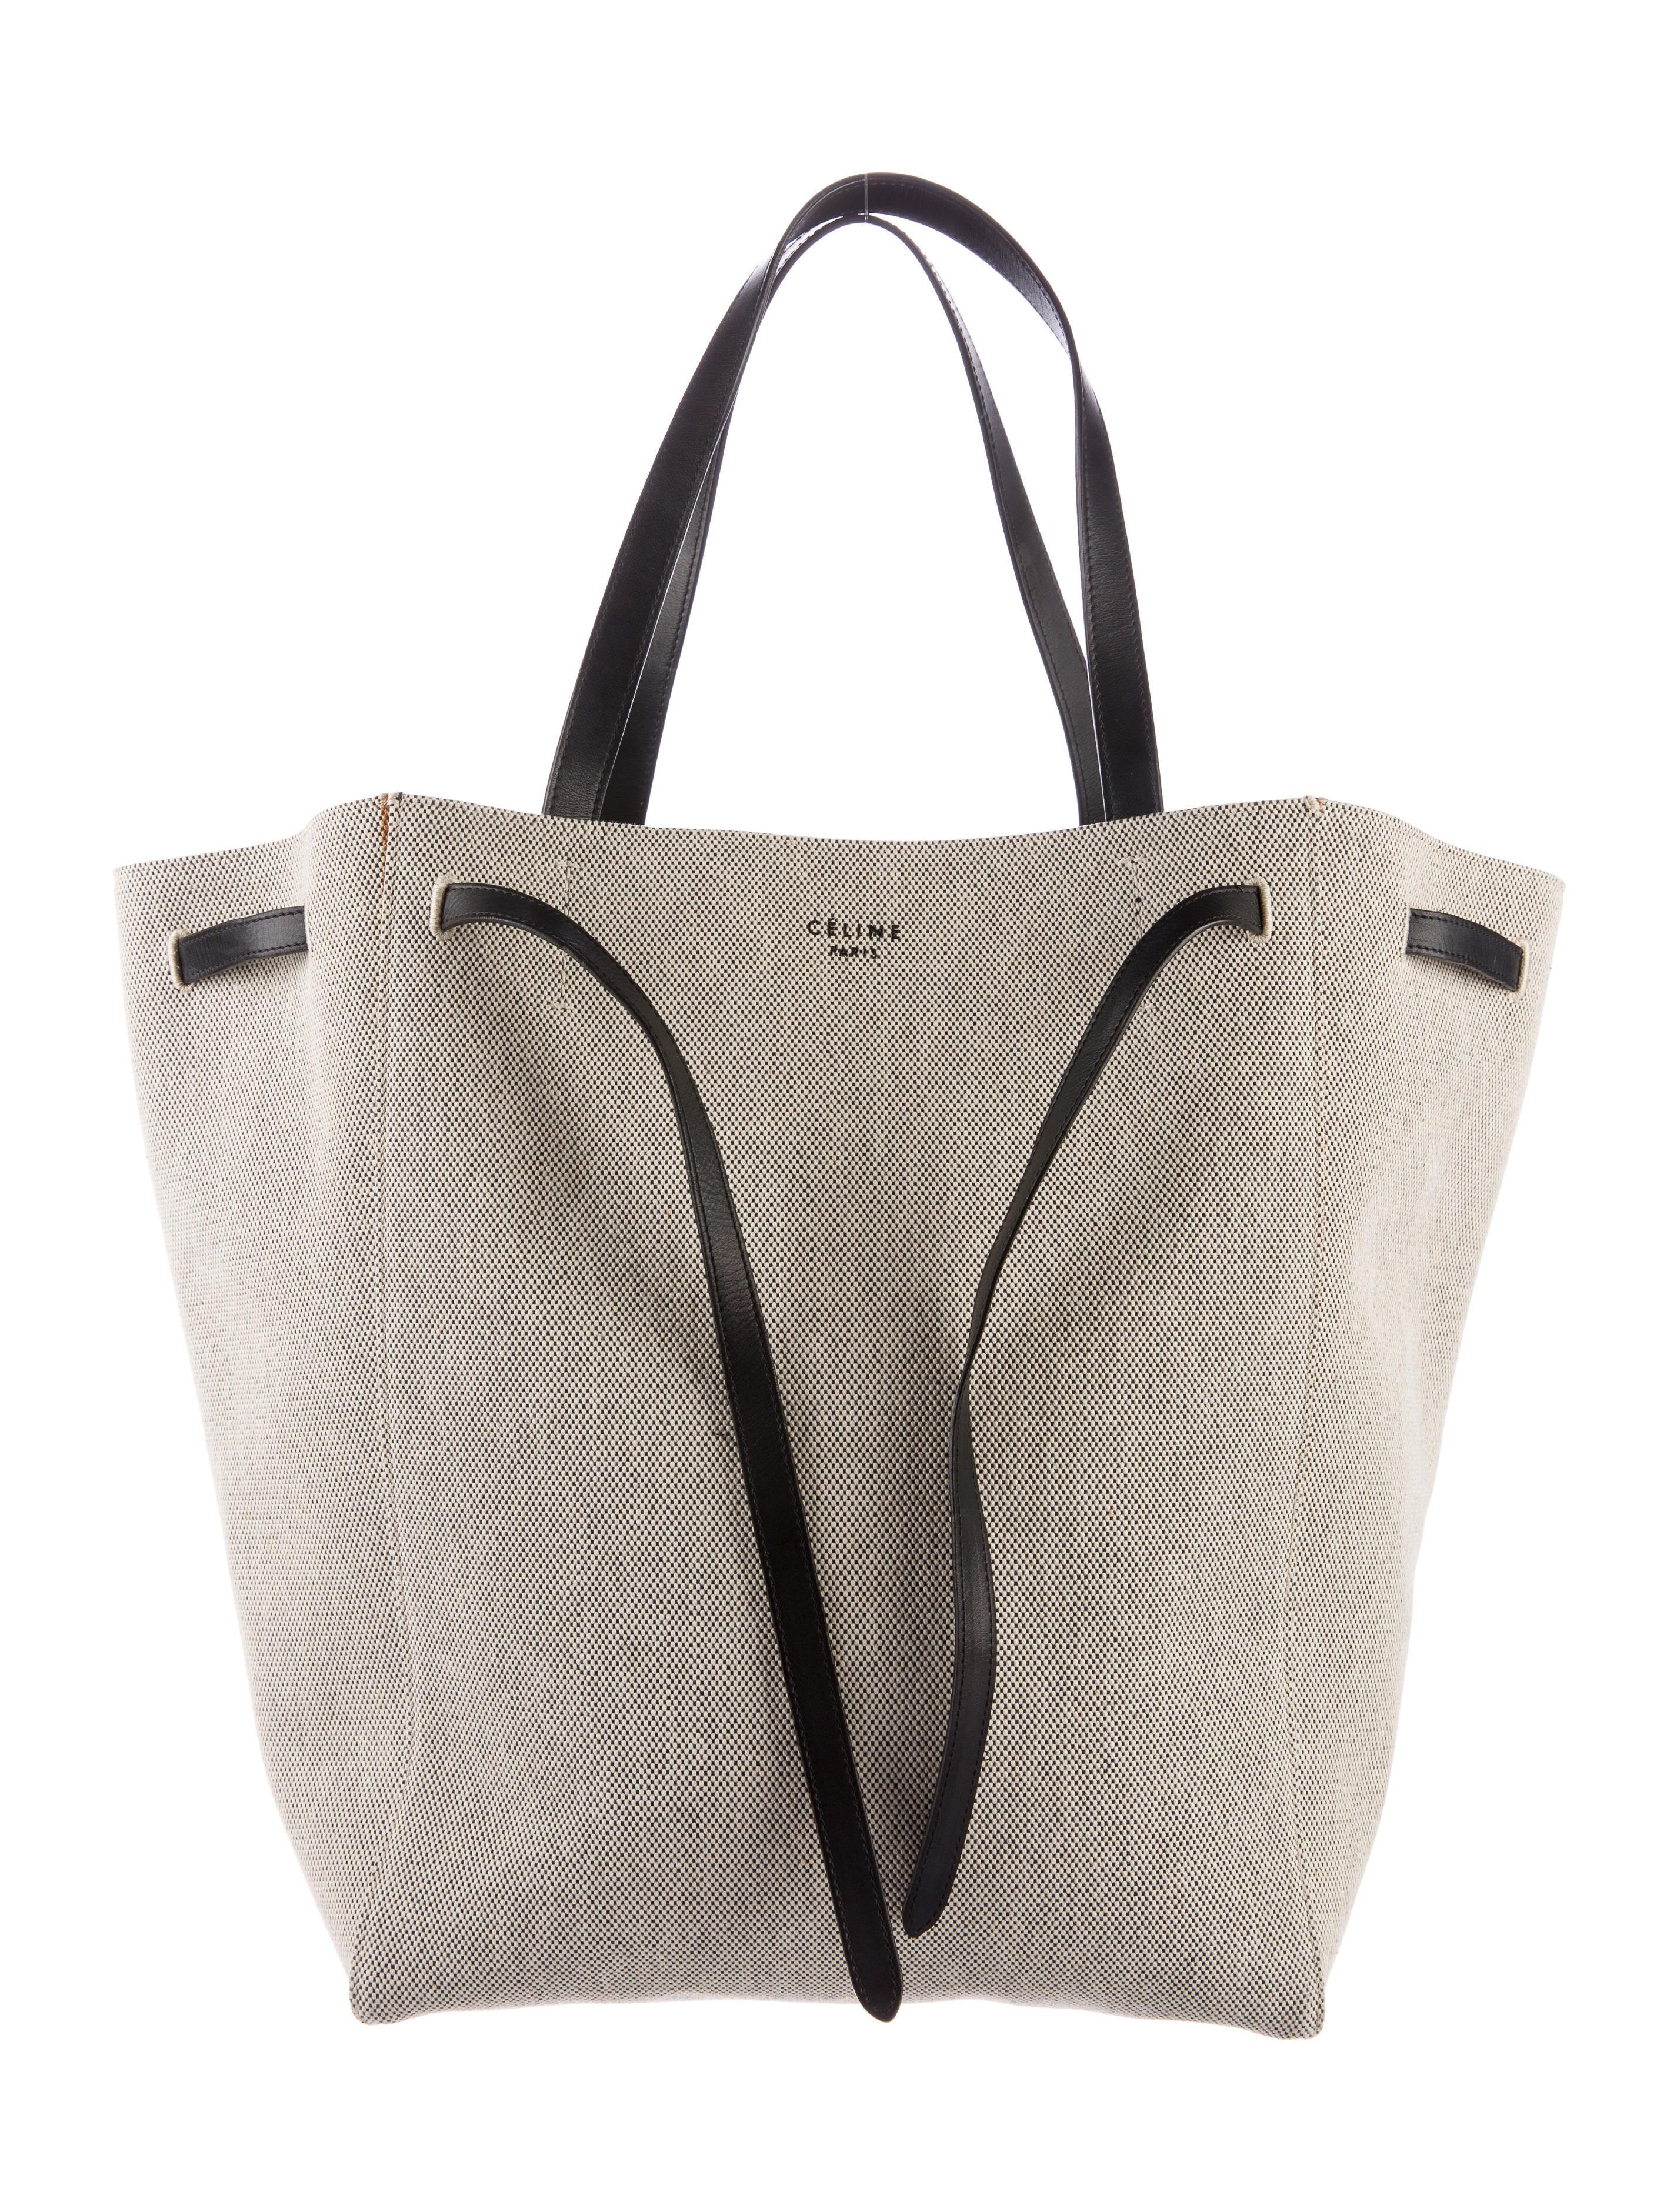 a8f62c073c5b Celine Céline Canvas Cabas Phantom Tote - Handbags - CEL48334